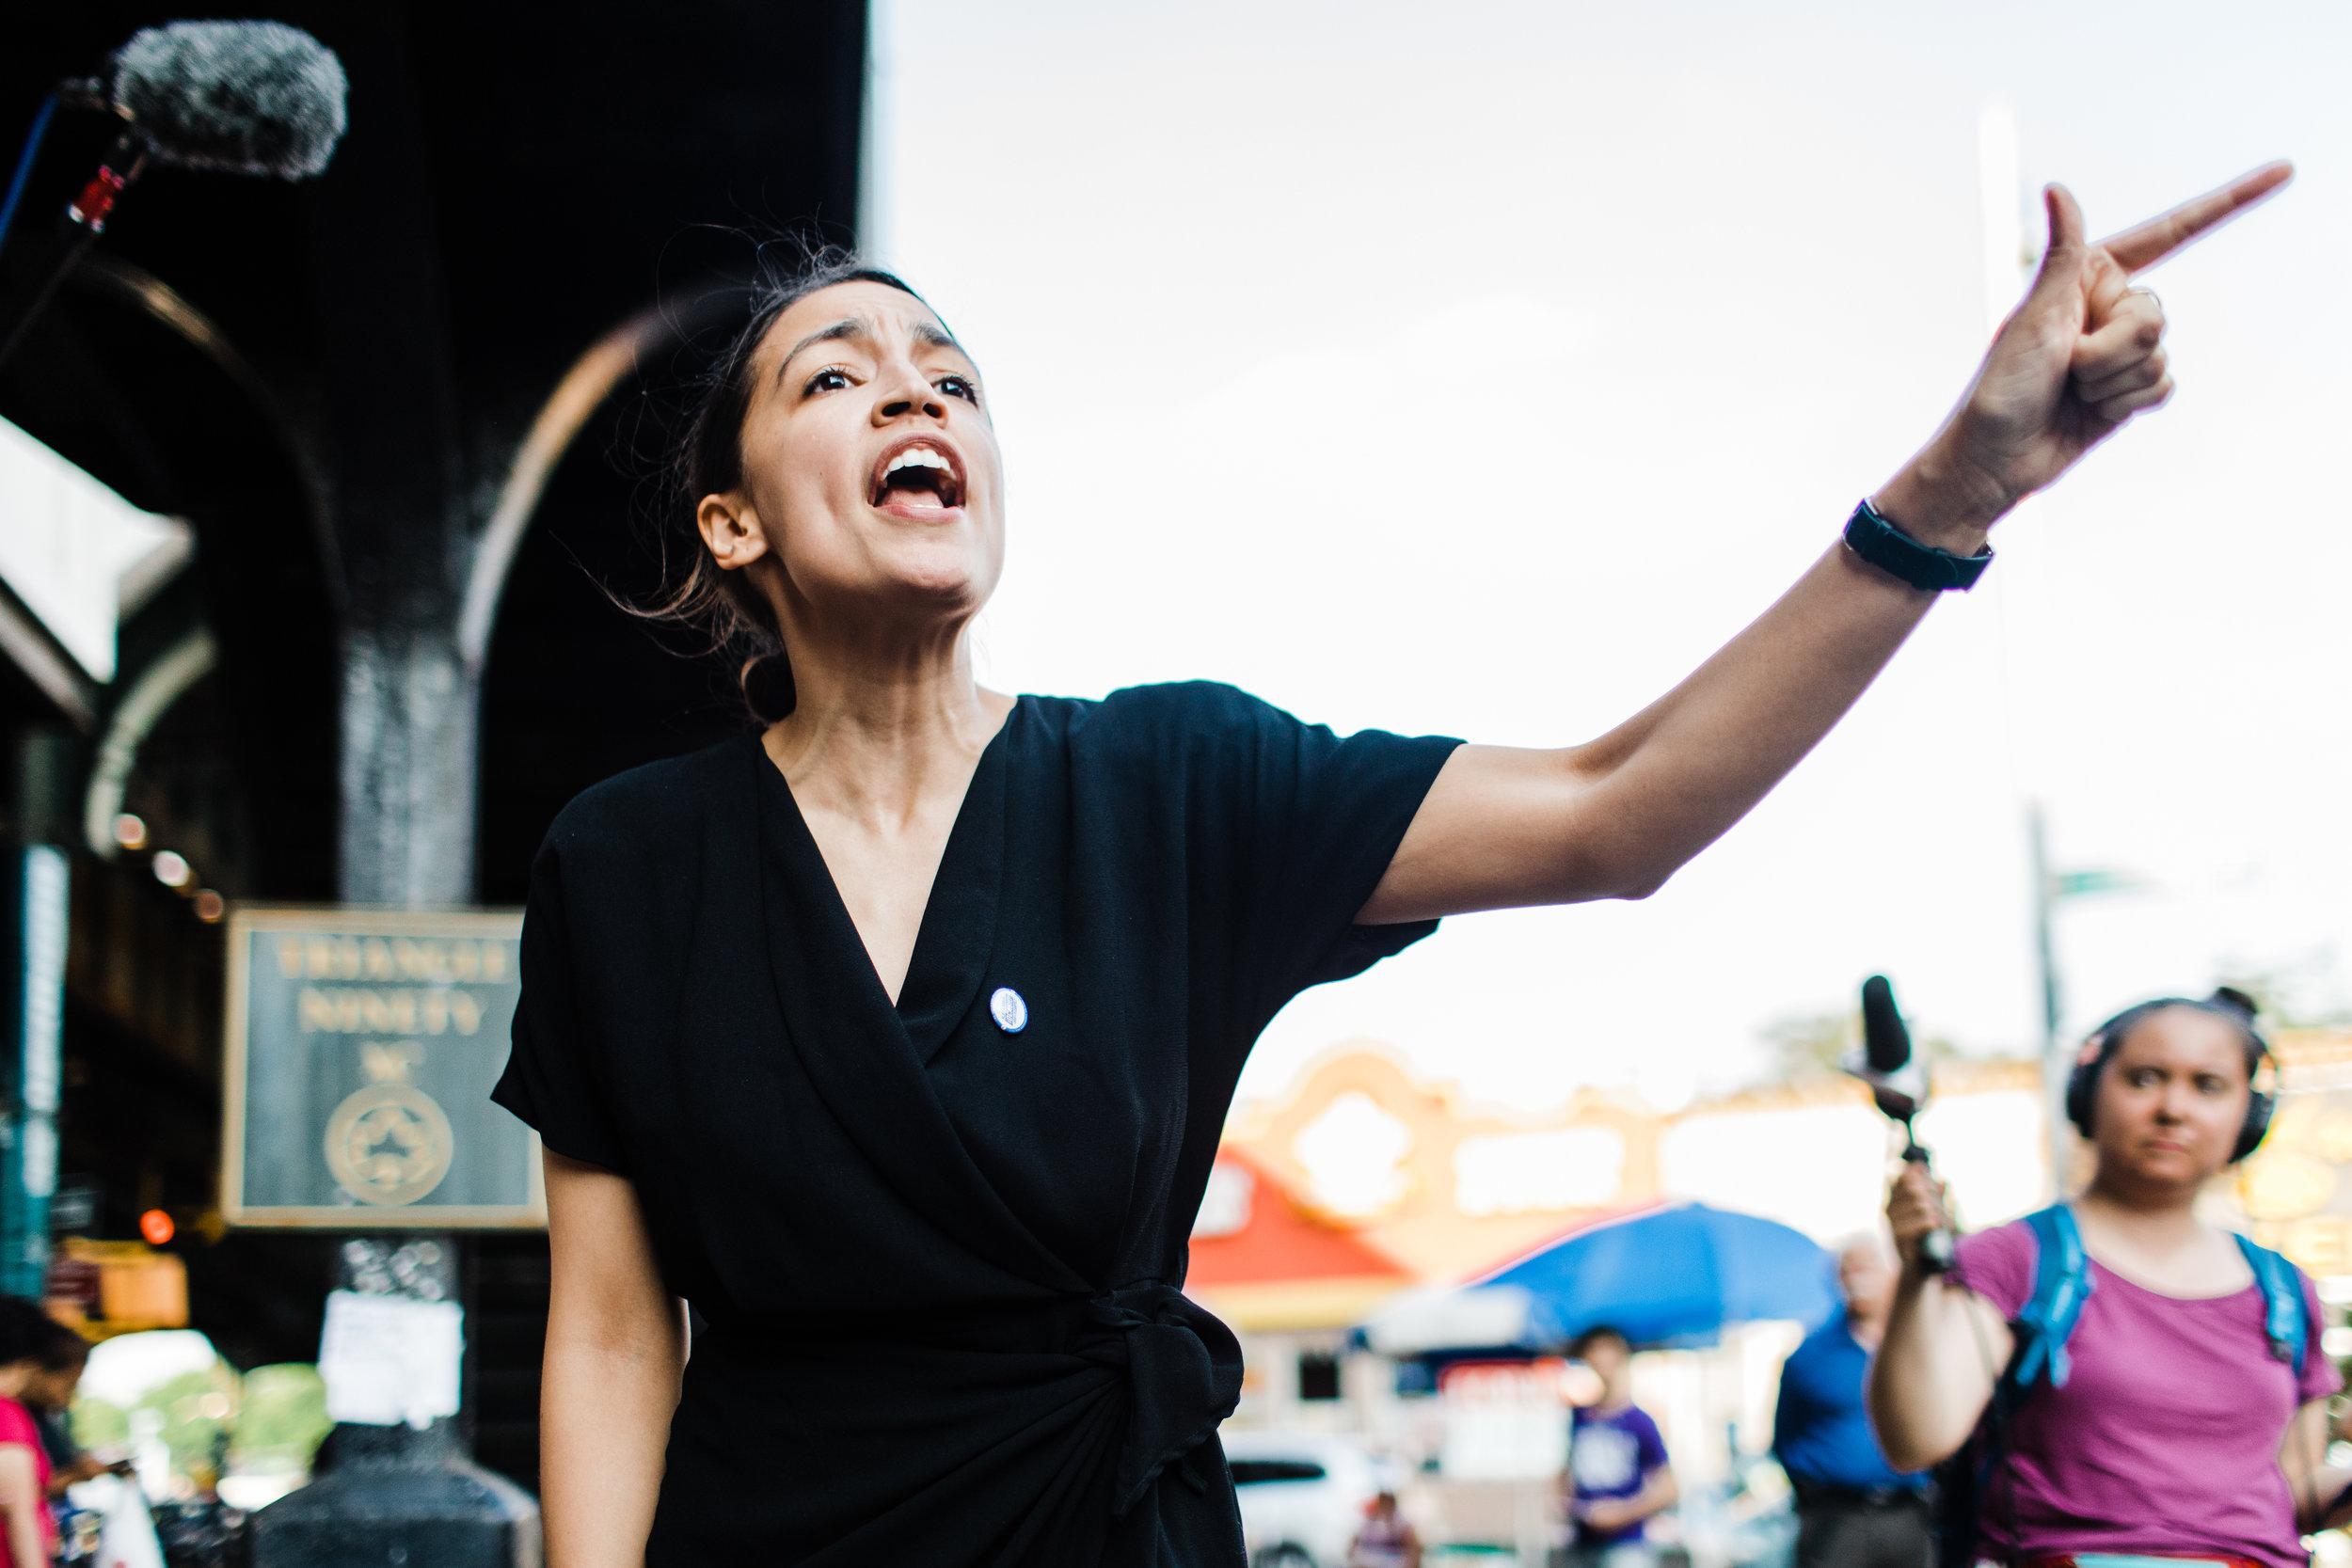 Alexandria Ocasio-Cortez | Photography by Corey Torpie